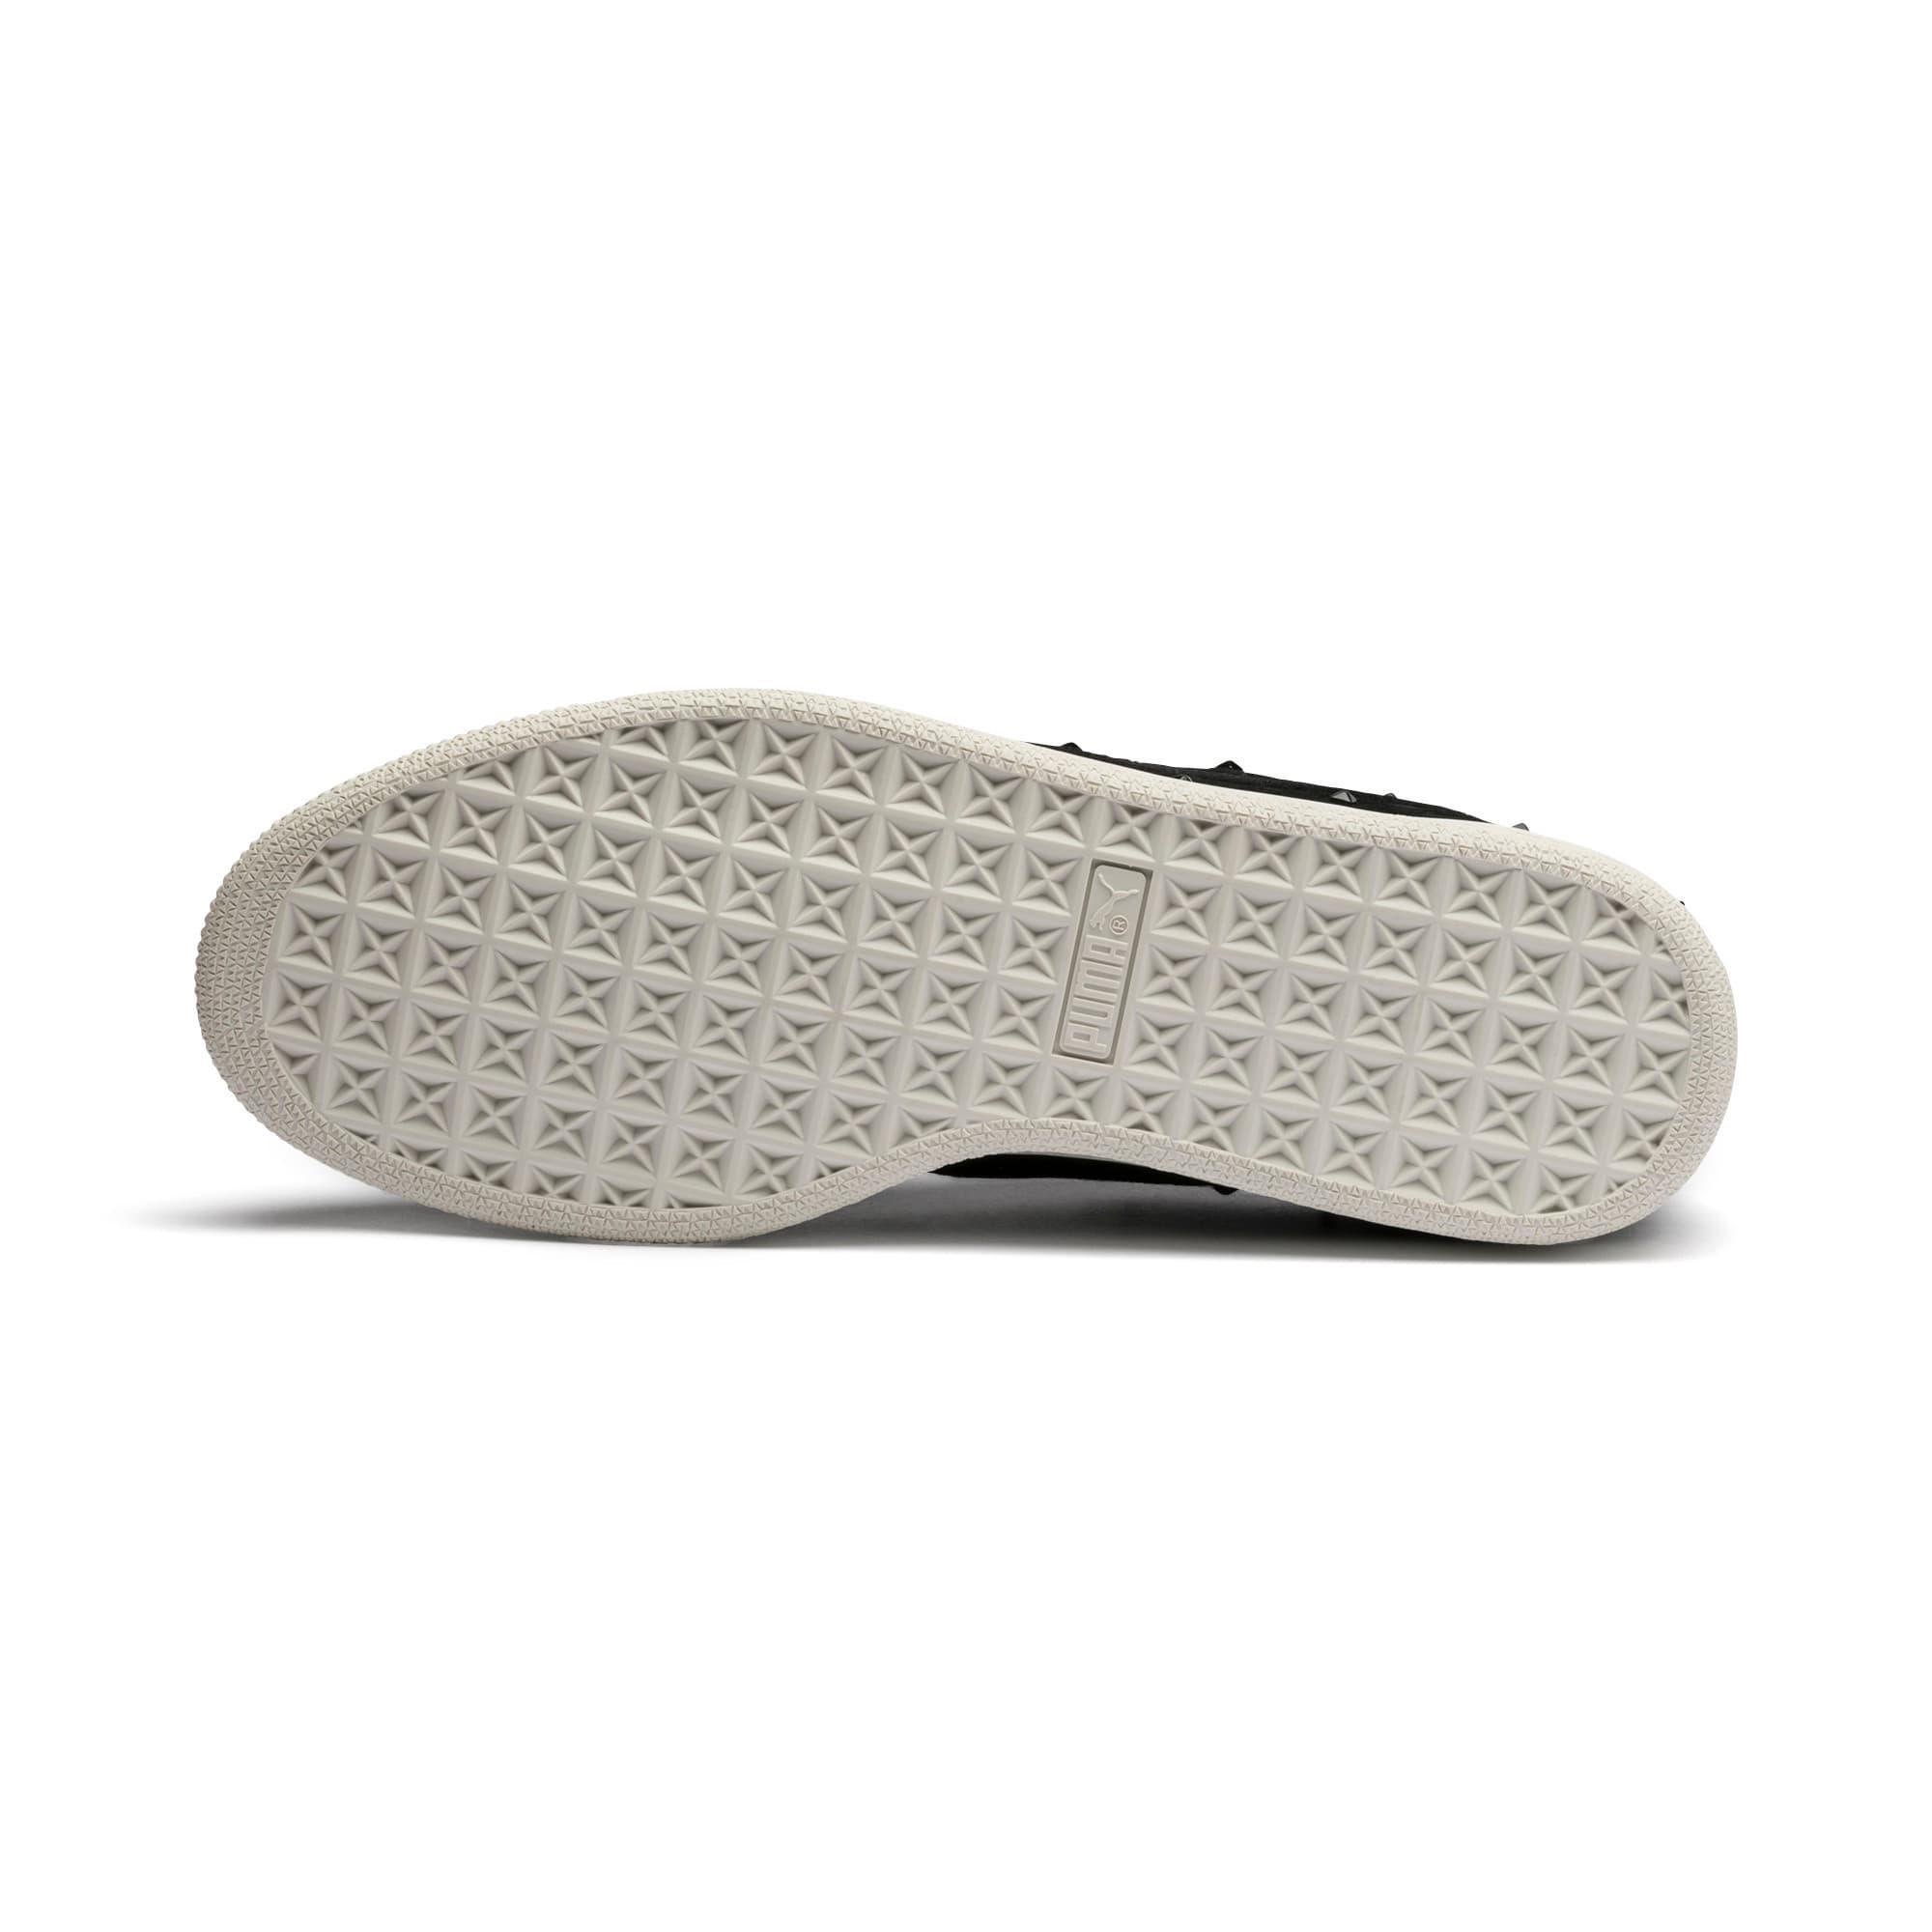 Thumbnail 5 of Suede Studs Damen Sneaker, Puma Black-Marshmallow, medium